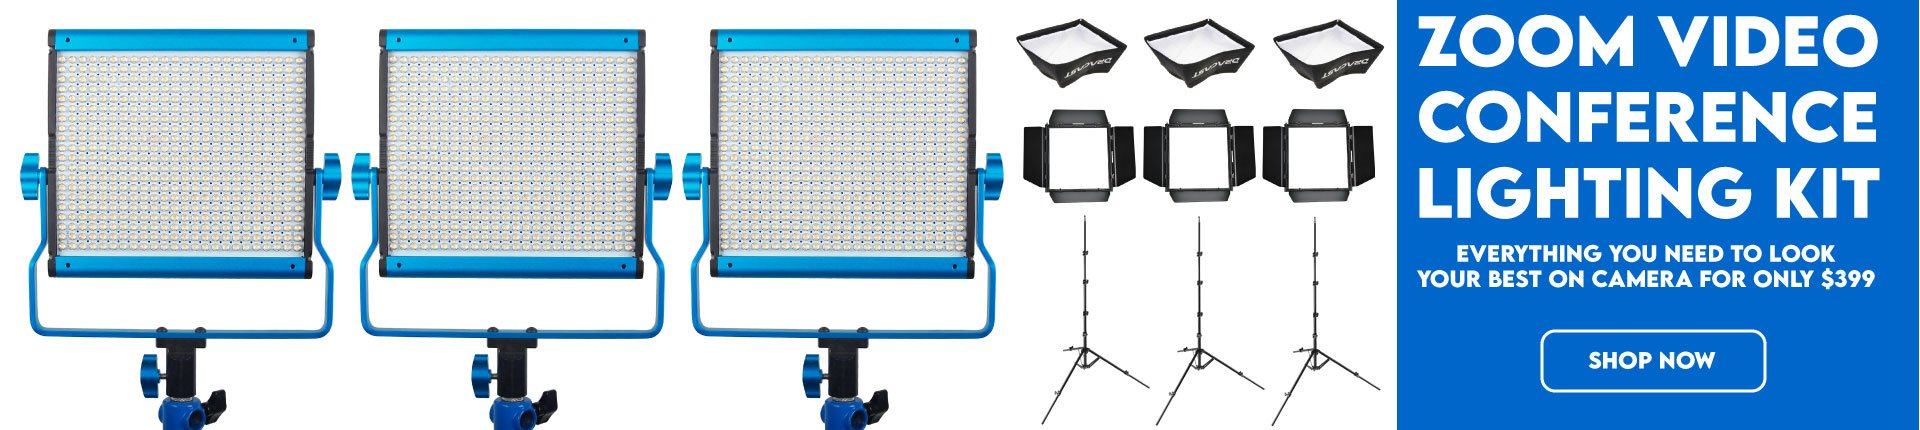 Dracast video conference LED lighting kit for zoom